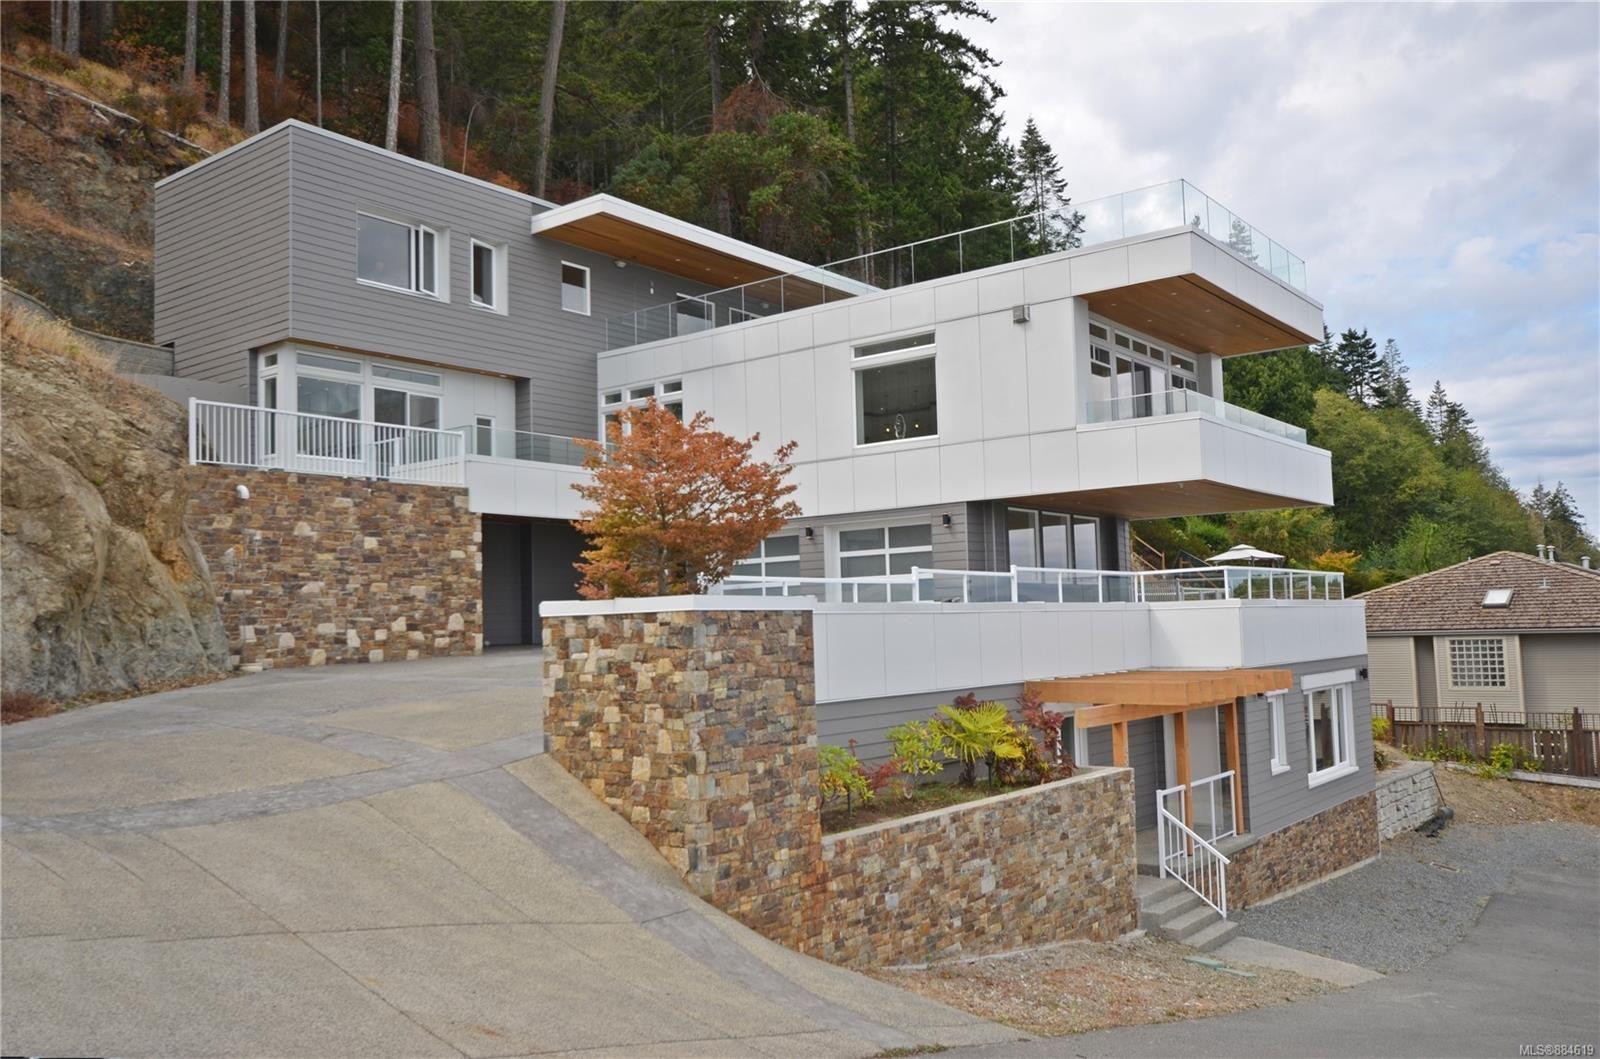 Main Photo: 3887 Gulfview Dr in : Na North Nanaimo House for sale (Nanaimo)  : MLS®# 884619